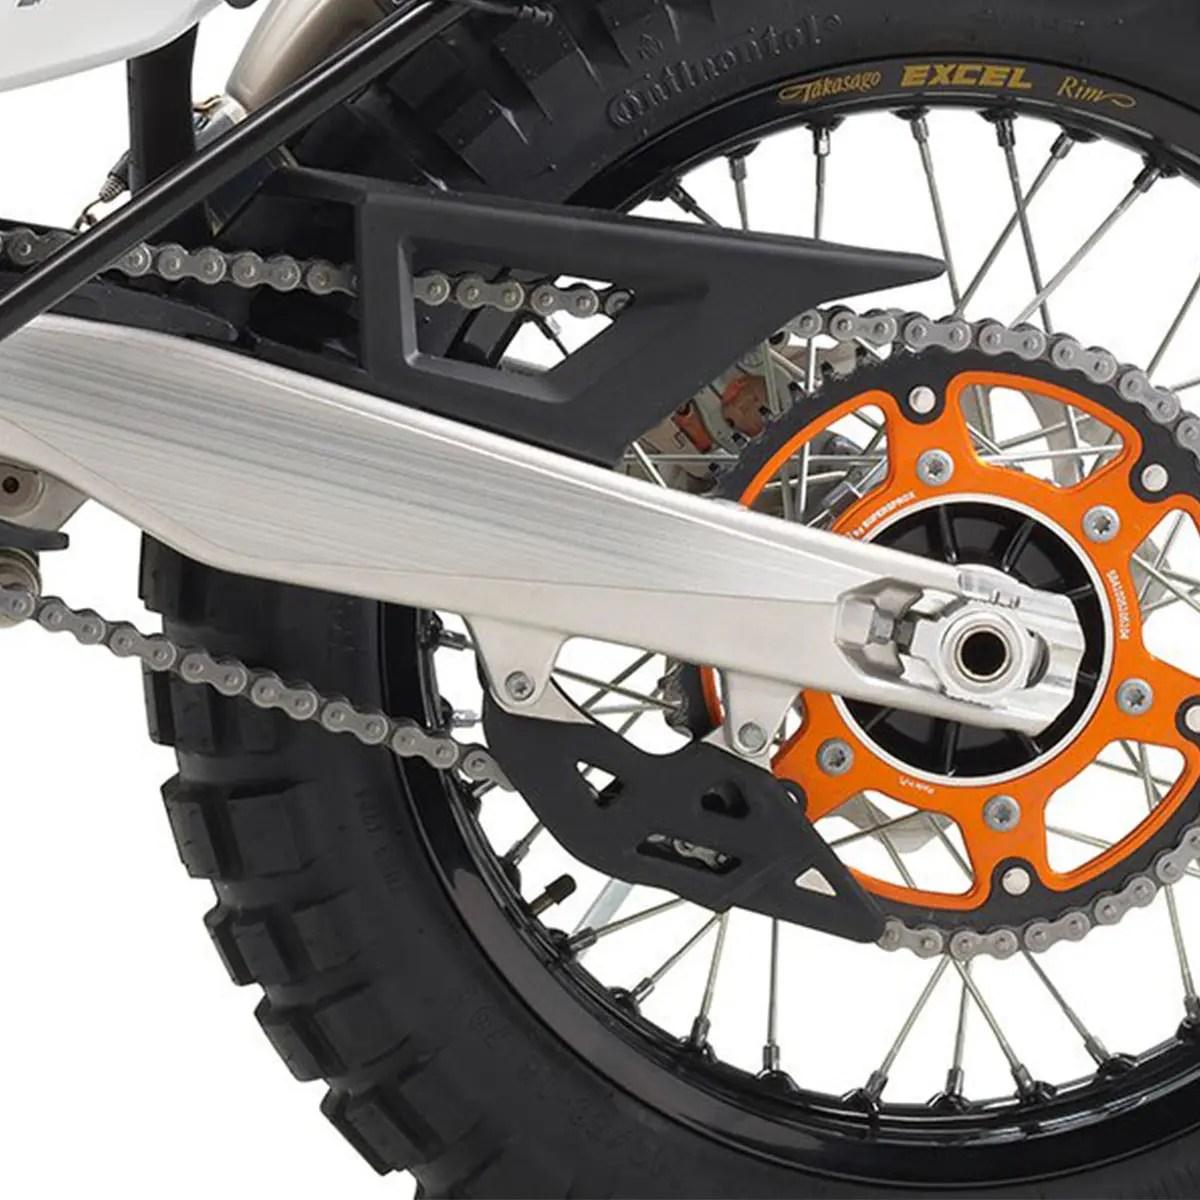 bras-oscillant-450-rally-replica-2020